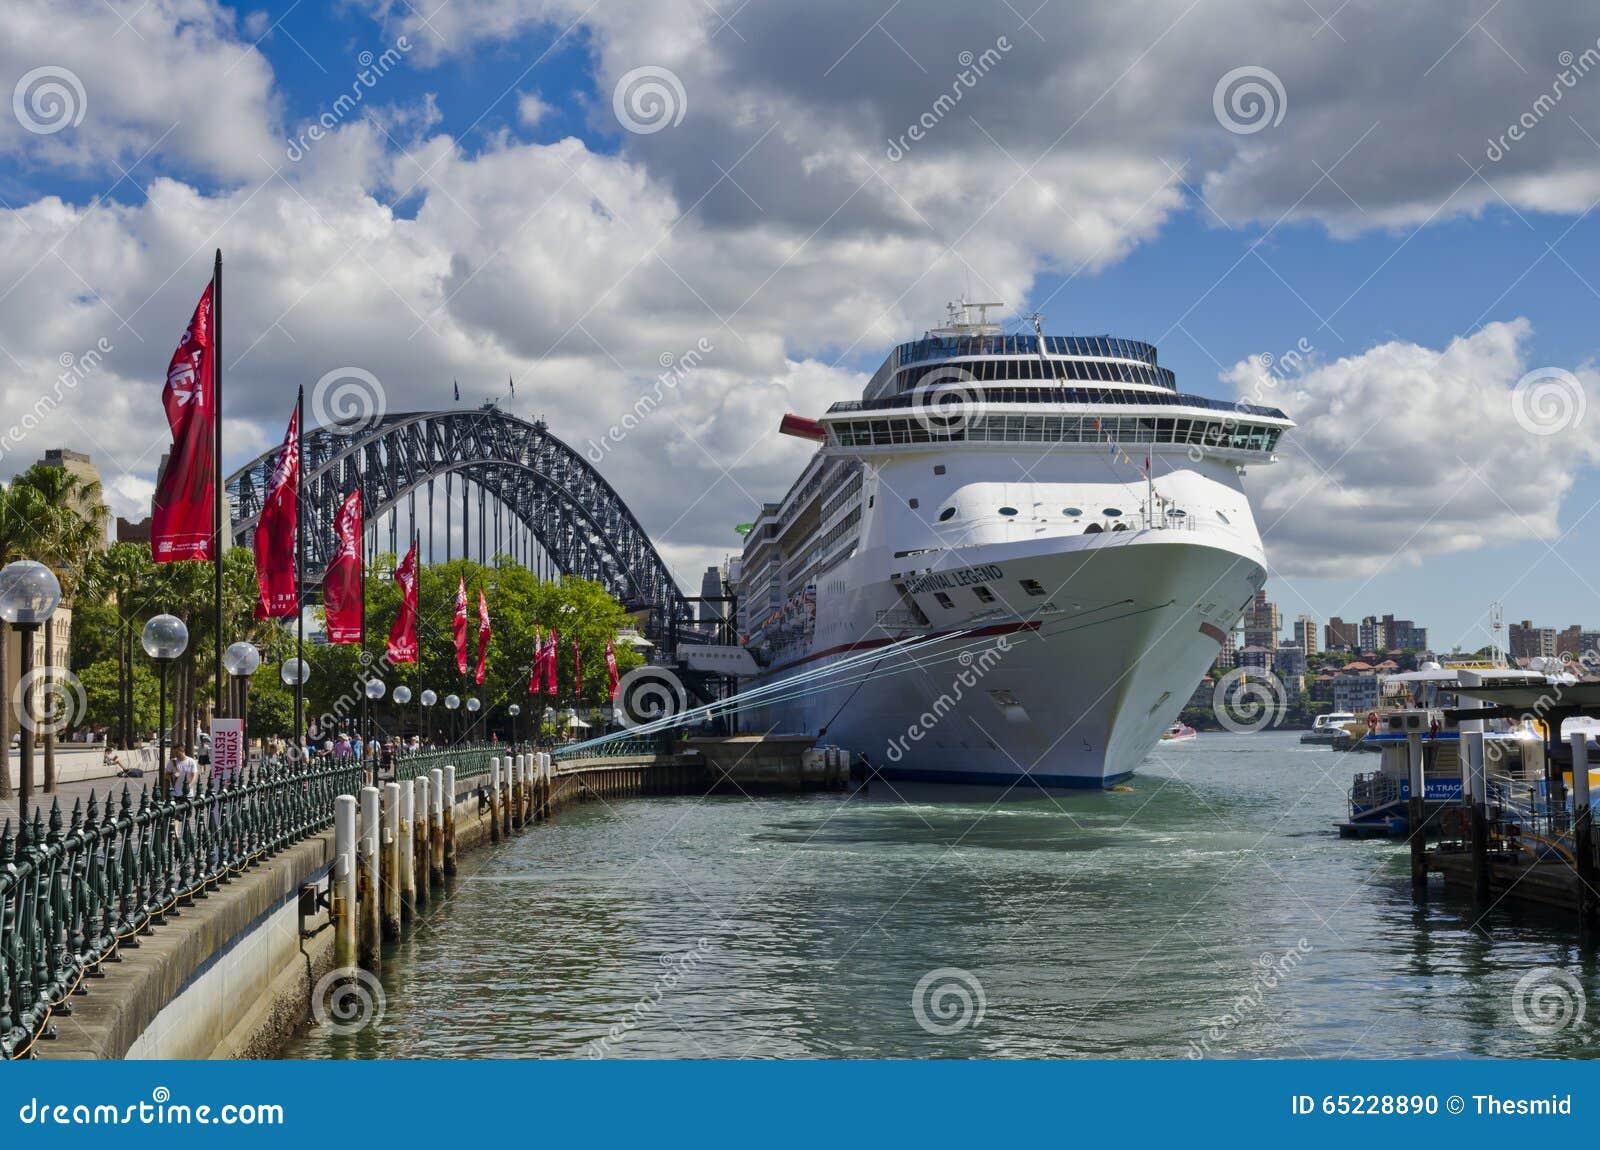 Carnival Legend Cruise Ship and Bridge